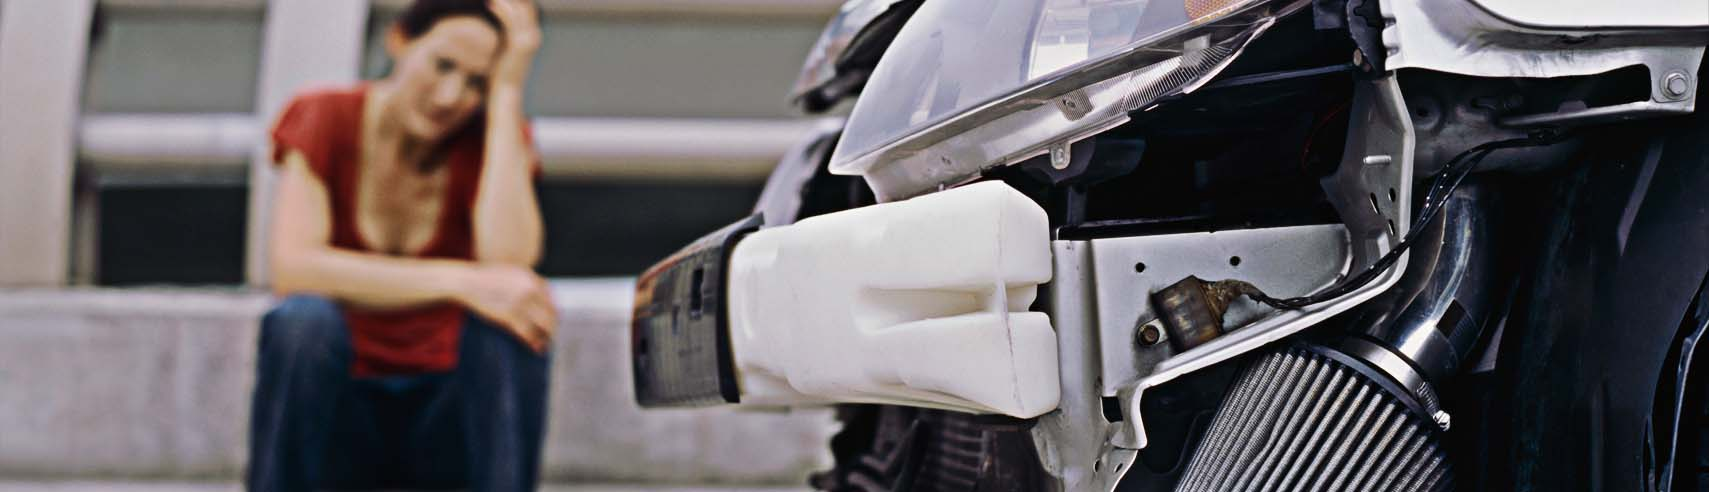 Car Wreck Injury Lawyer Baton Rouge LA, TX, NY | Fisher